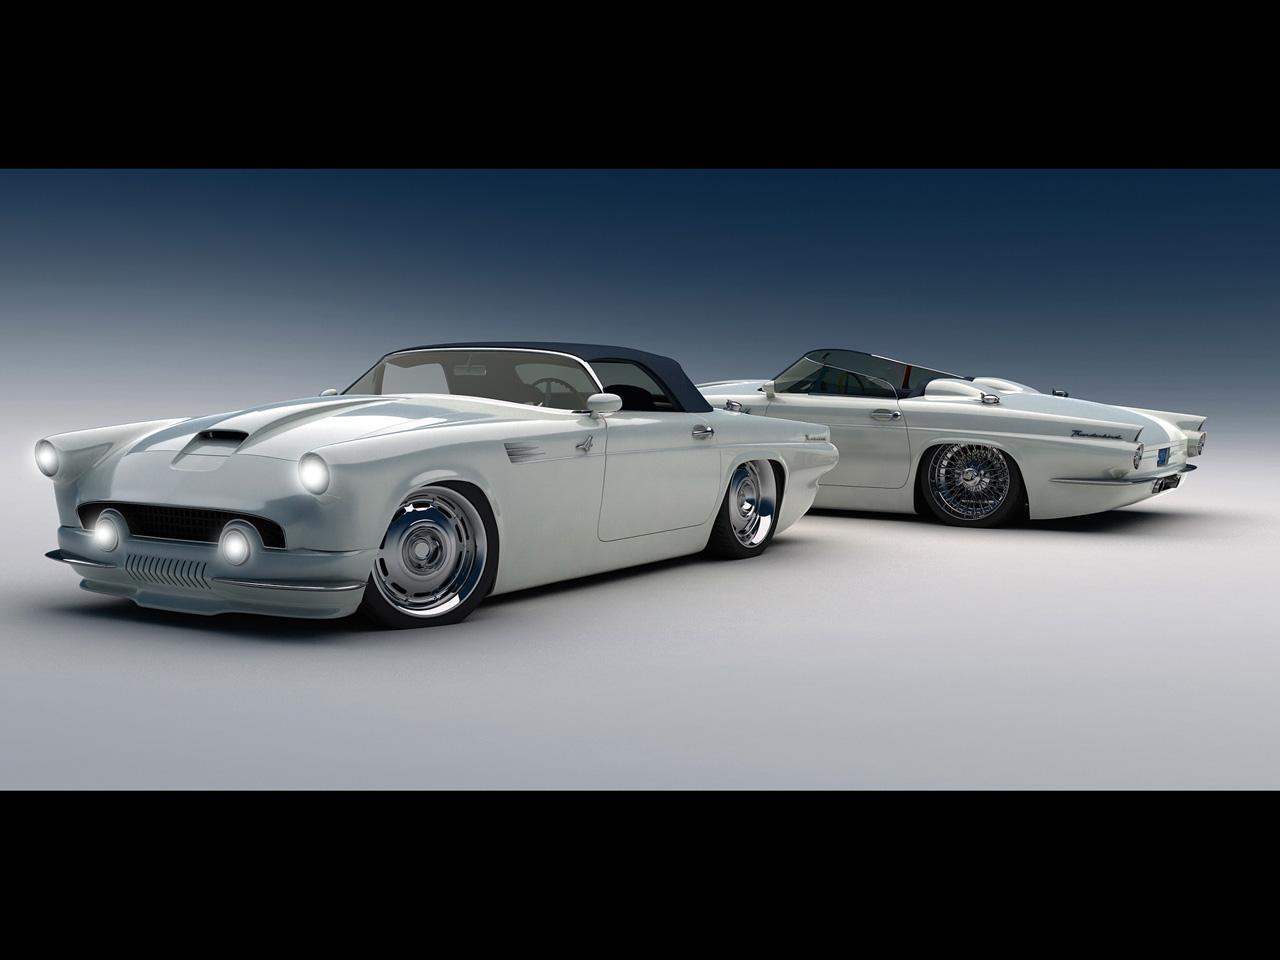 1955-Ford-Thunderbird-Custom-from-Vizualtech-Duo-1280x960.jpg.42e8b4e1c186eda23a4885dcadcbc9f2.jpg